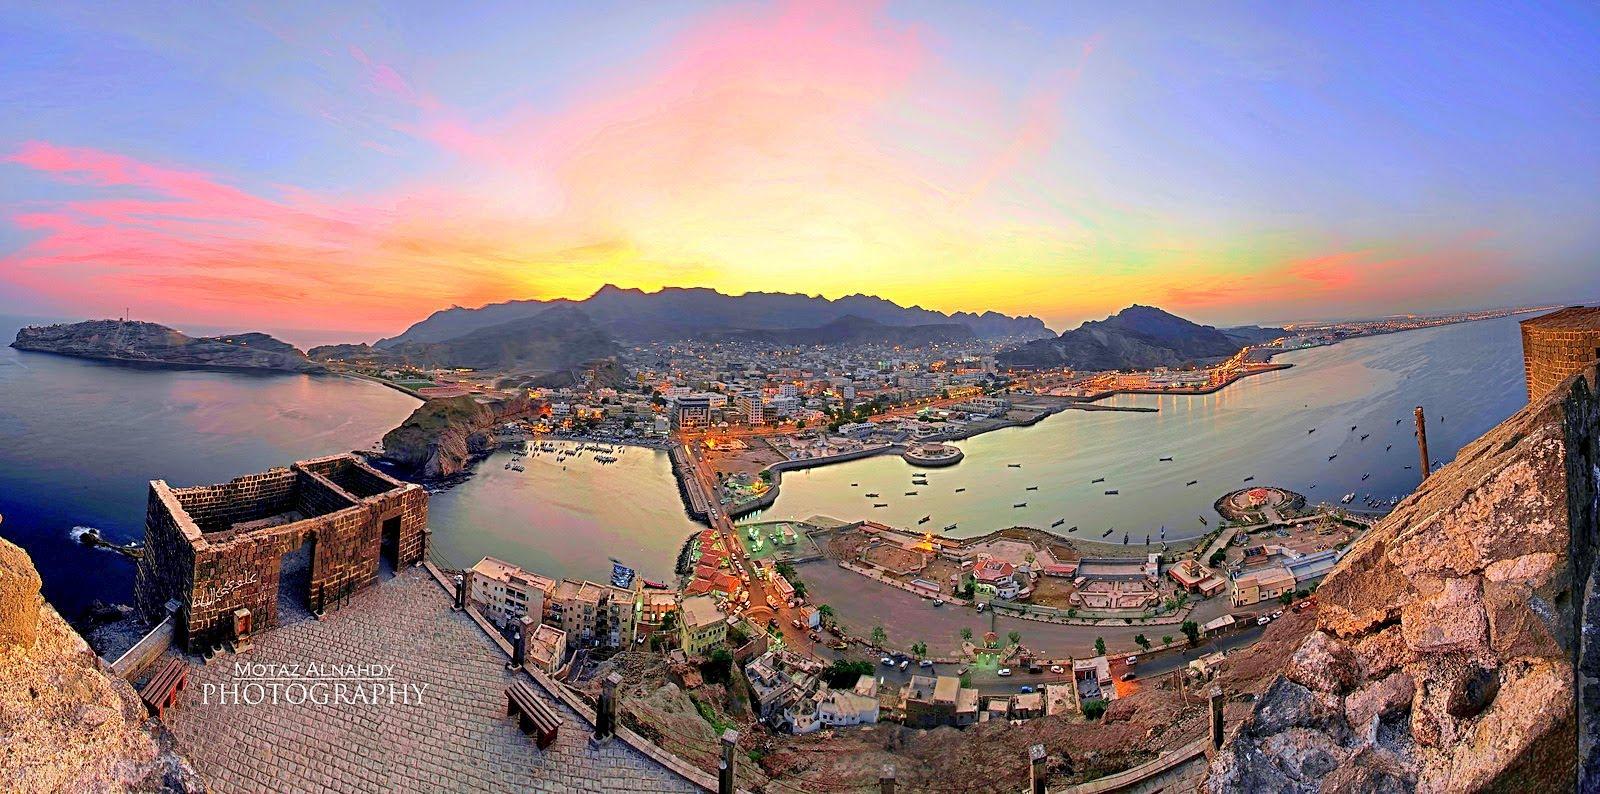 Aden, ancienne capitale du Yémen